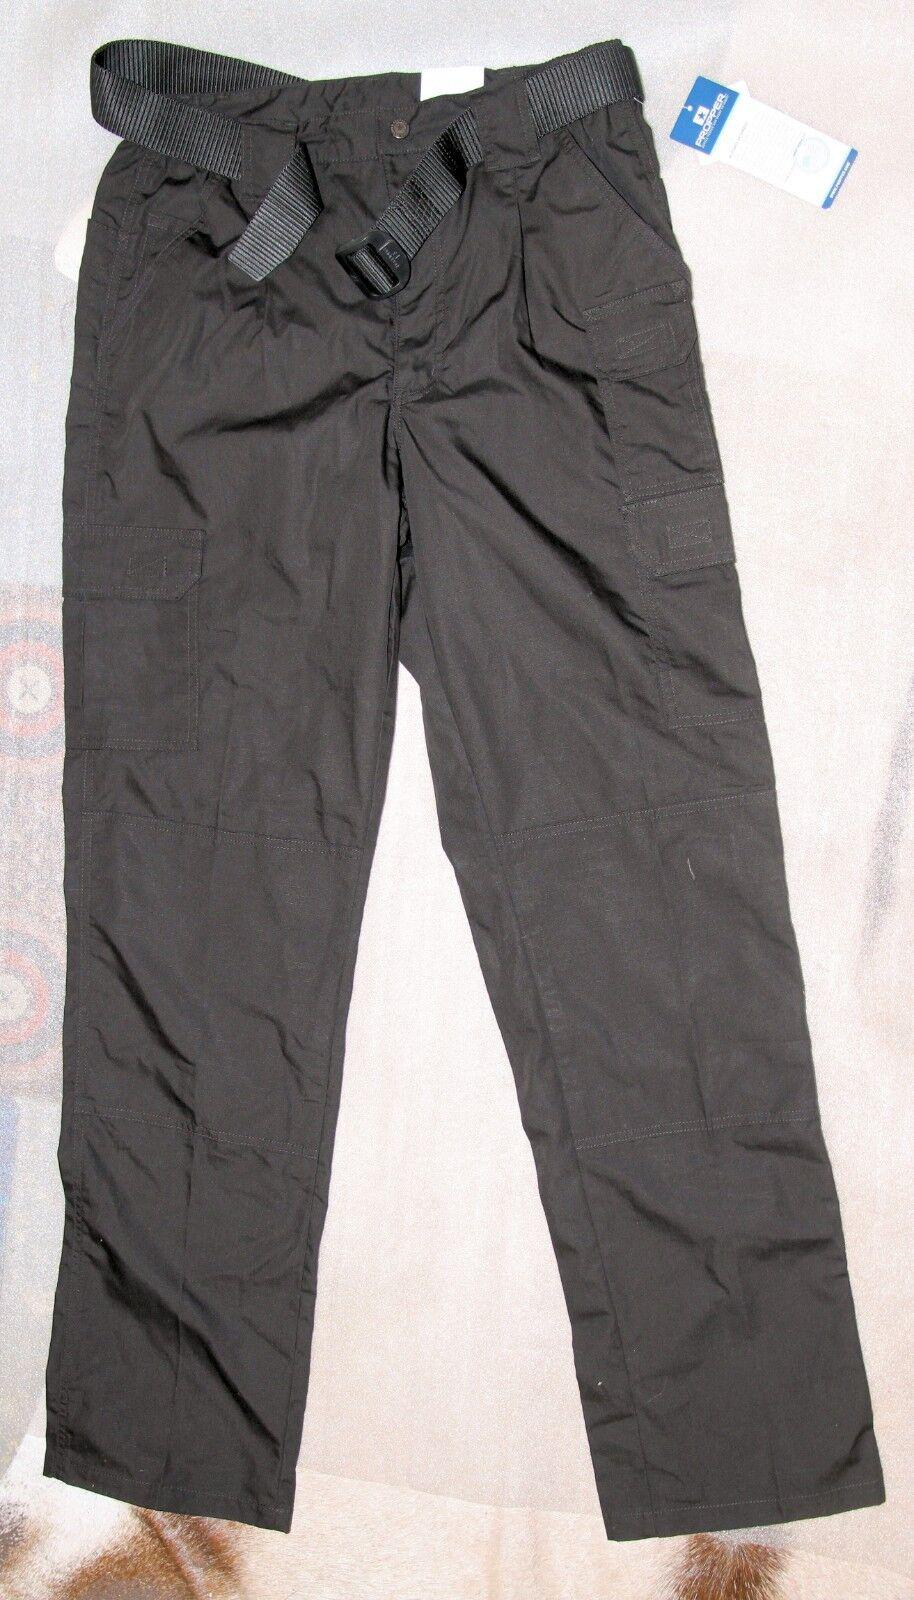 Propper® Men's Lightweight Tactical Pant with belt, 34 36